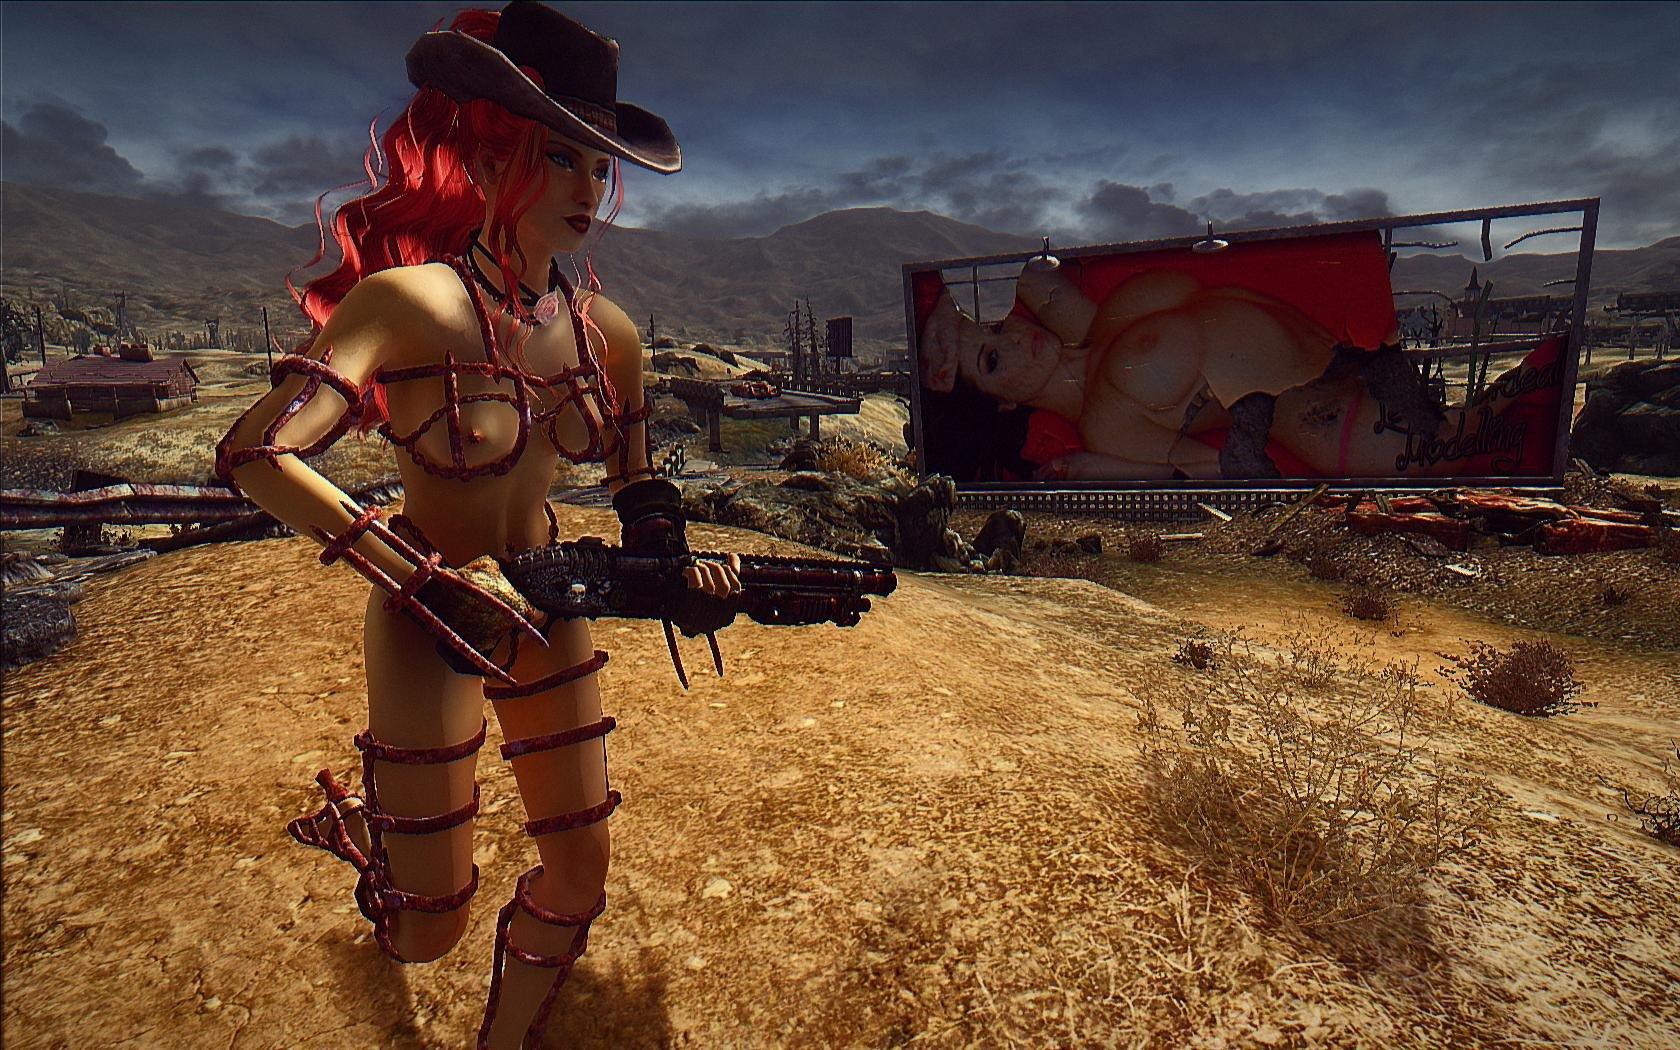 Fallout3 2019-04-10 13-06-02-81